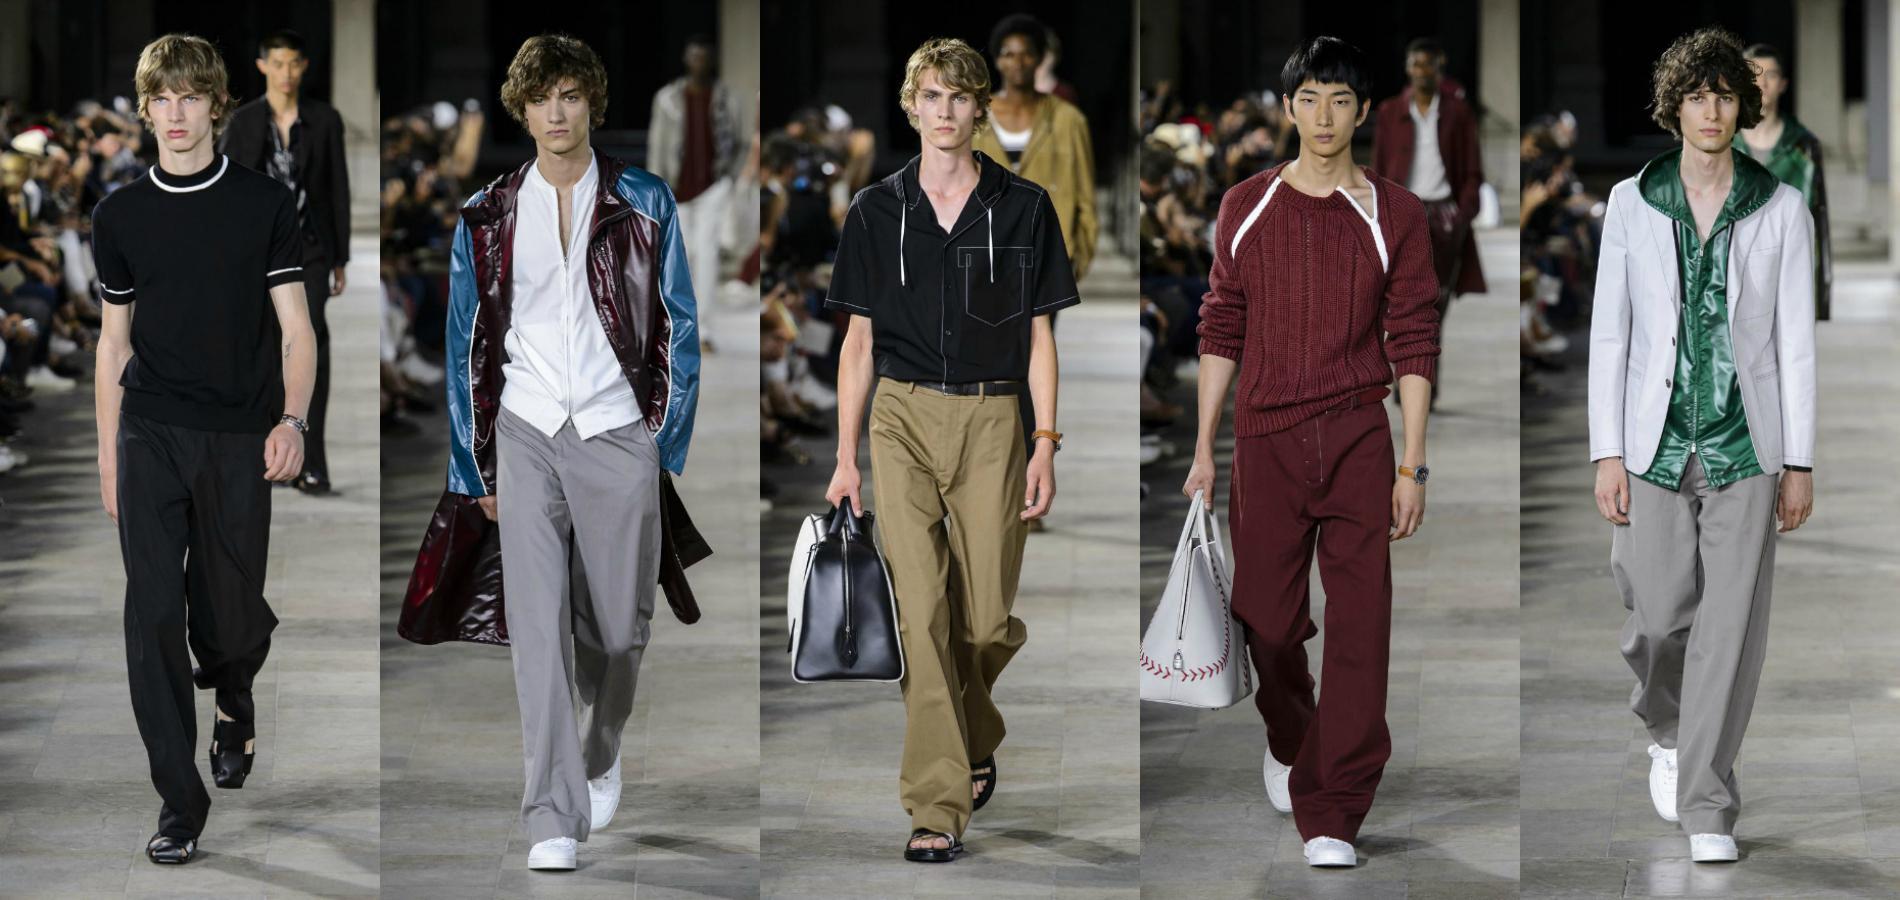 Défile Hermès, Fashion Week Printemps été 2018 de Paris. 0788b0c7b18